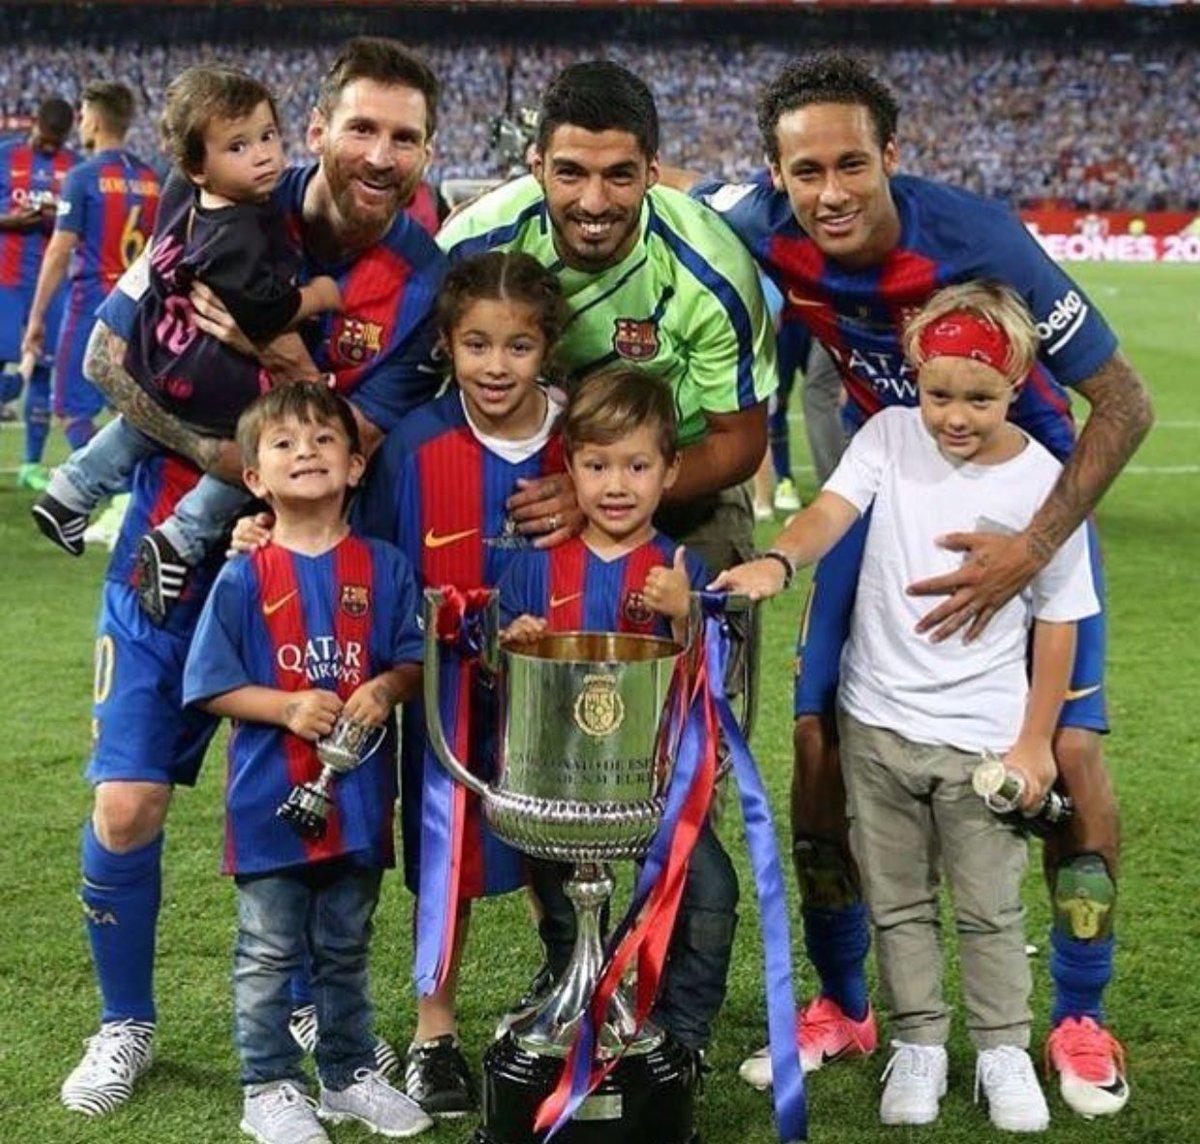 Barça - Alavés - Página 3 DA3dvhmXcAA0P3n?format=jpg